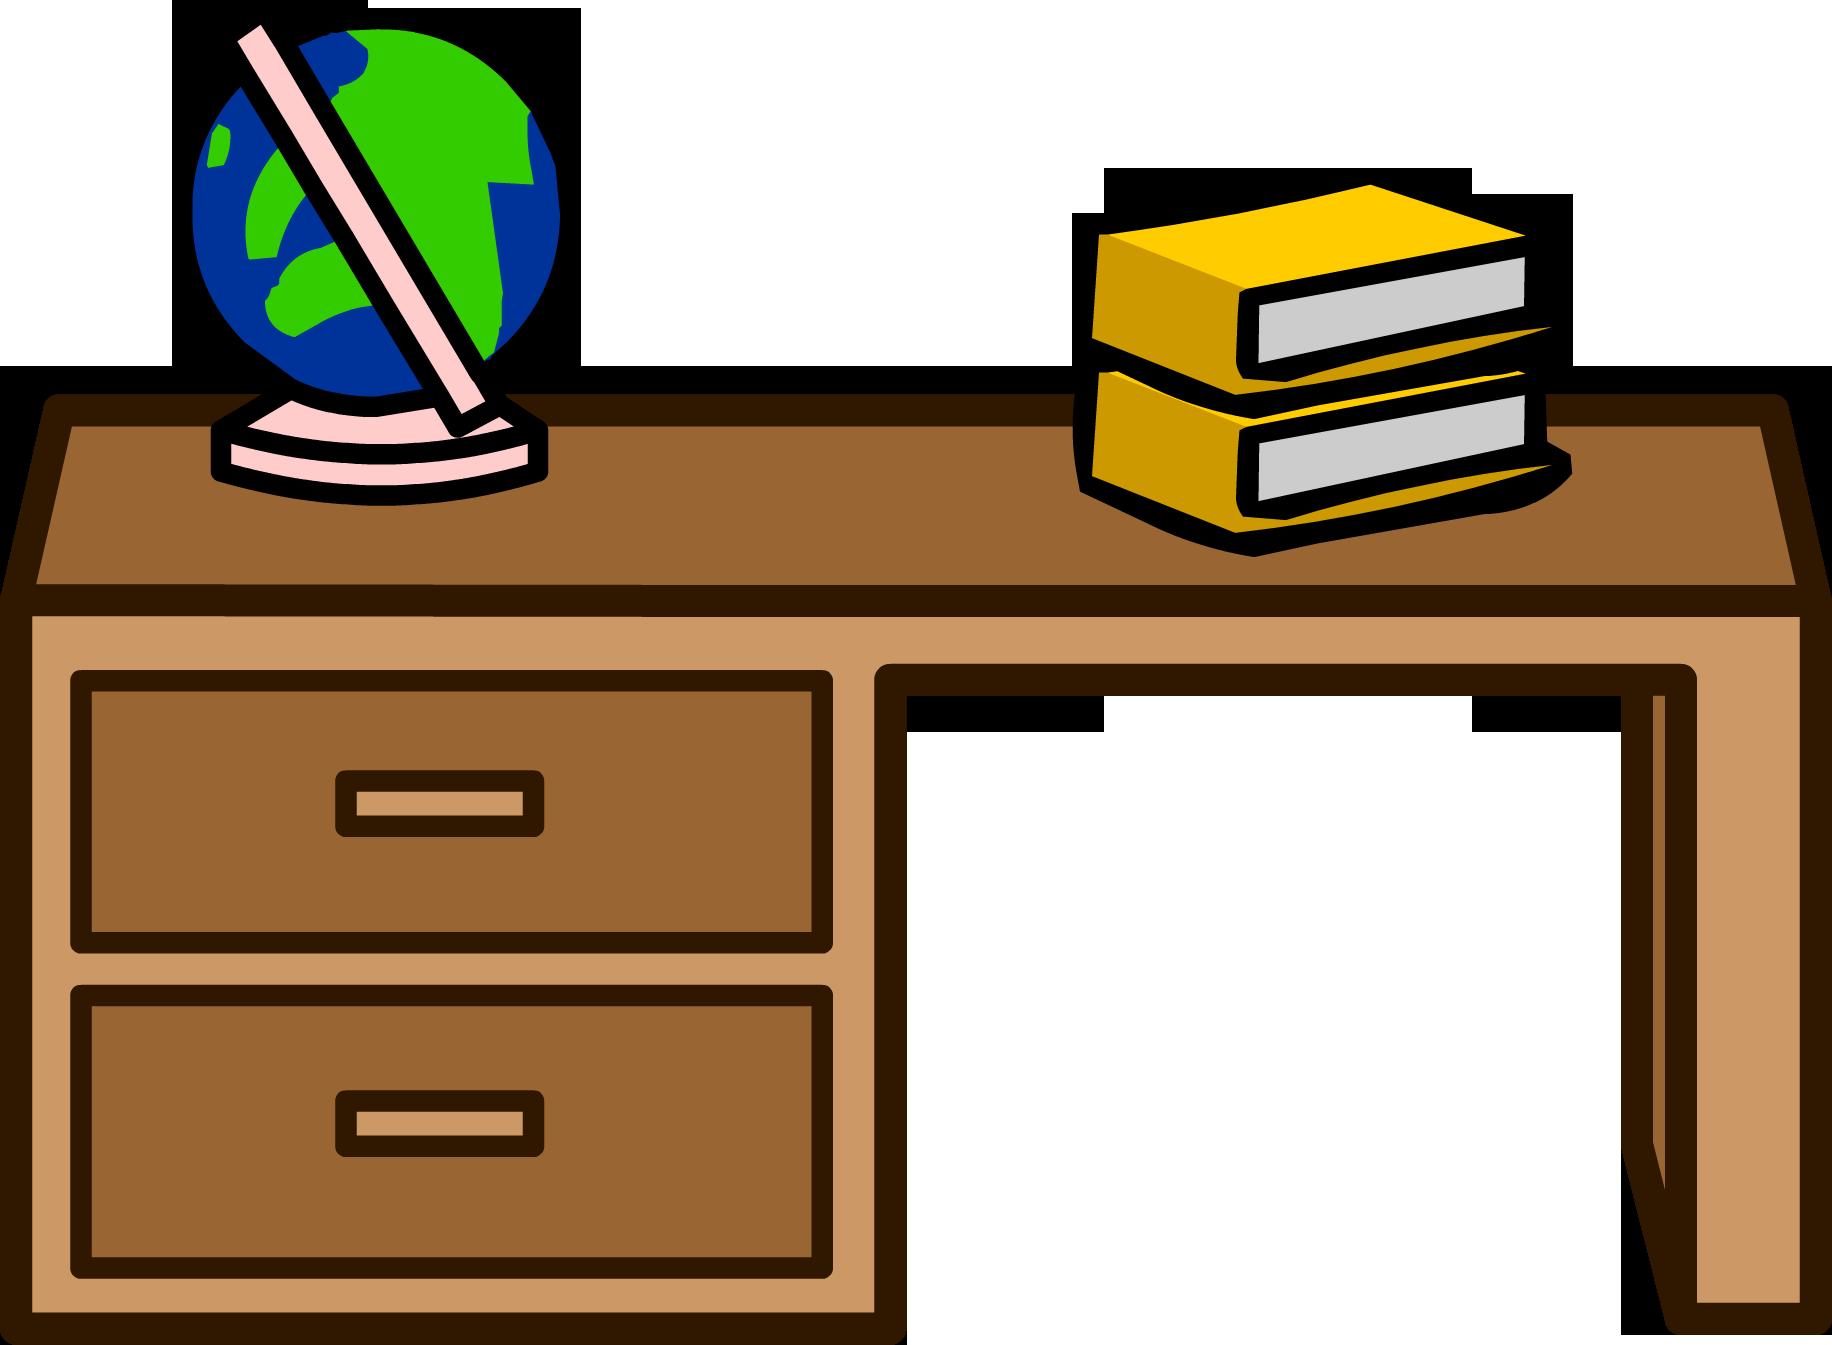 Teacher table clipart svg transparent stock Teacher Table Clipart | Free download best Teacher Table ... svg transparent stock